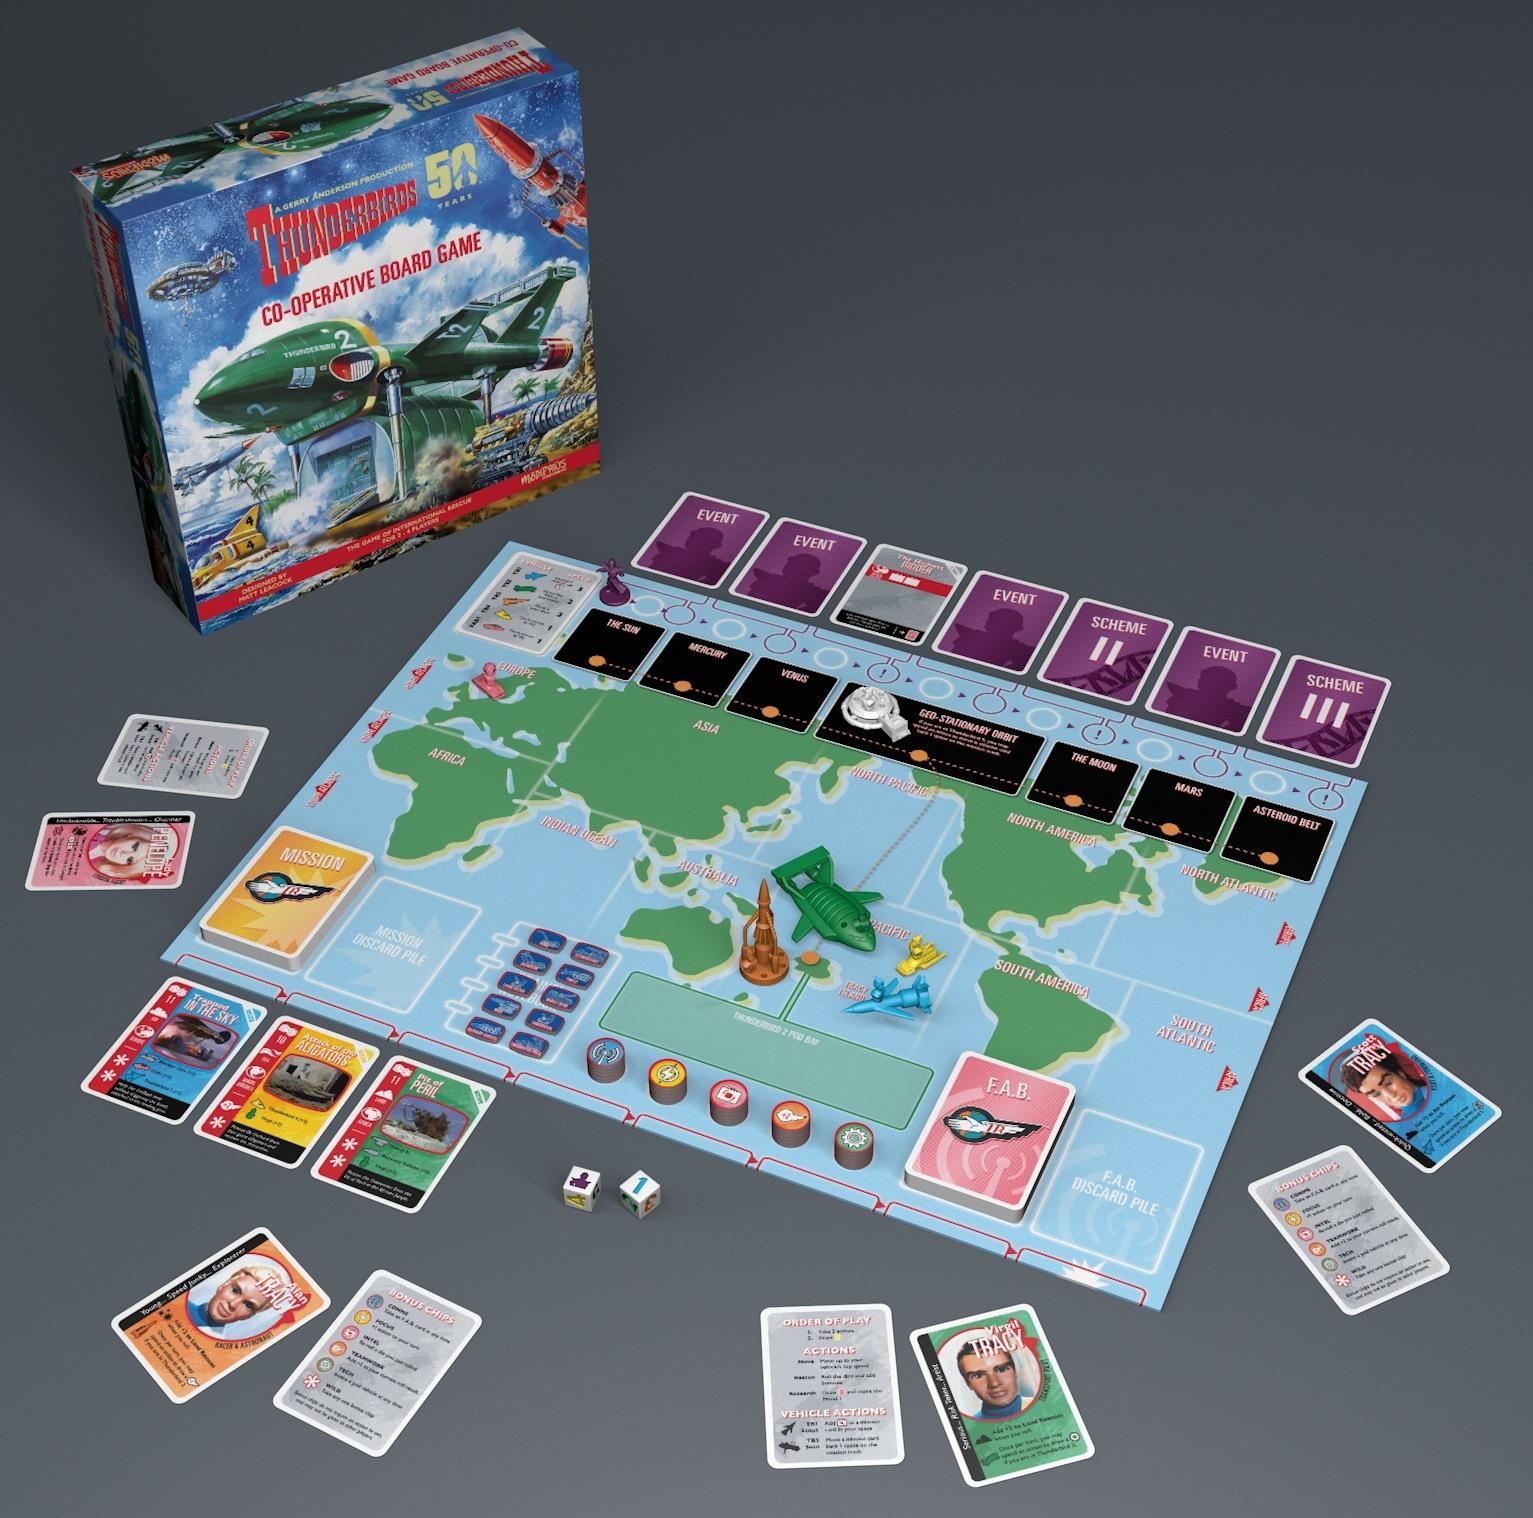 Thunderbird boardgame